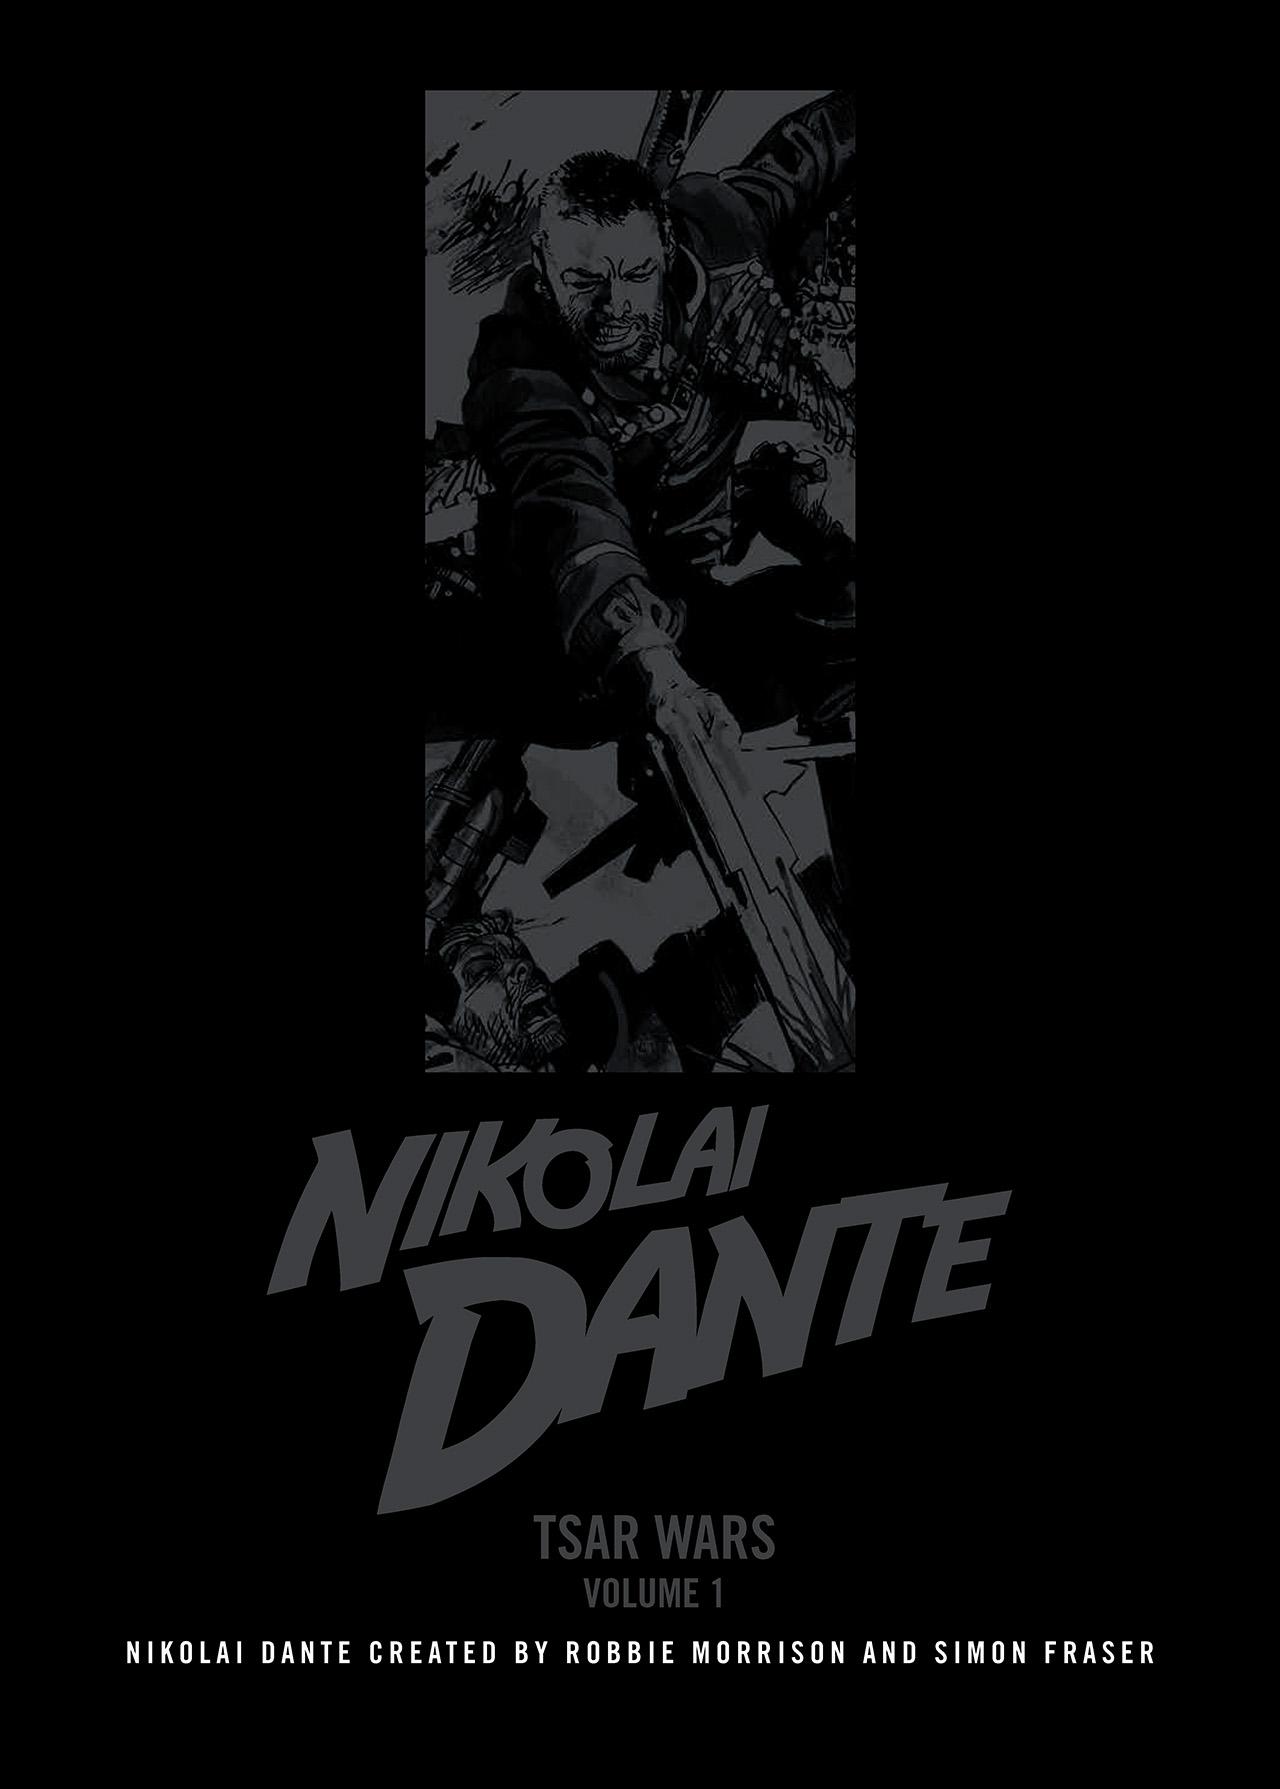 Read online Nikolai Dante comic -  Issue # TPB 4 - 2